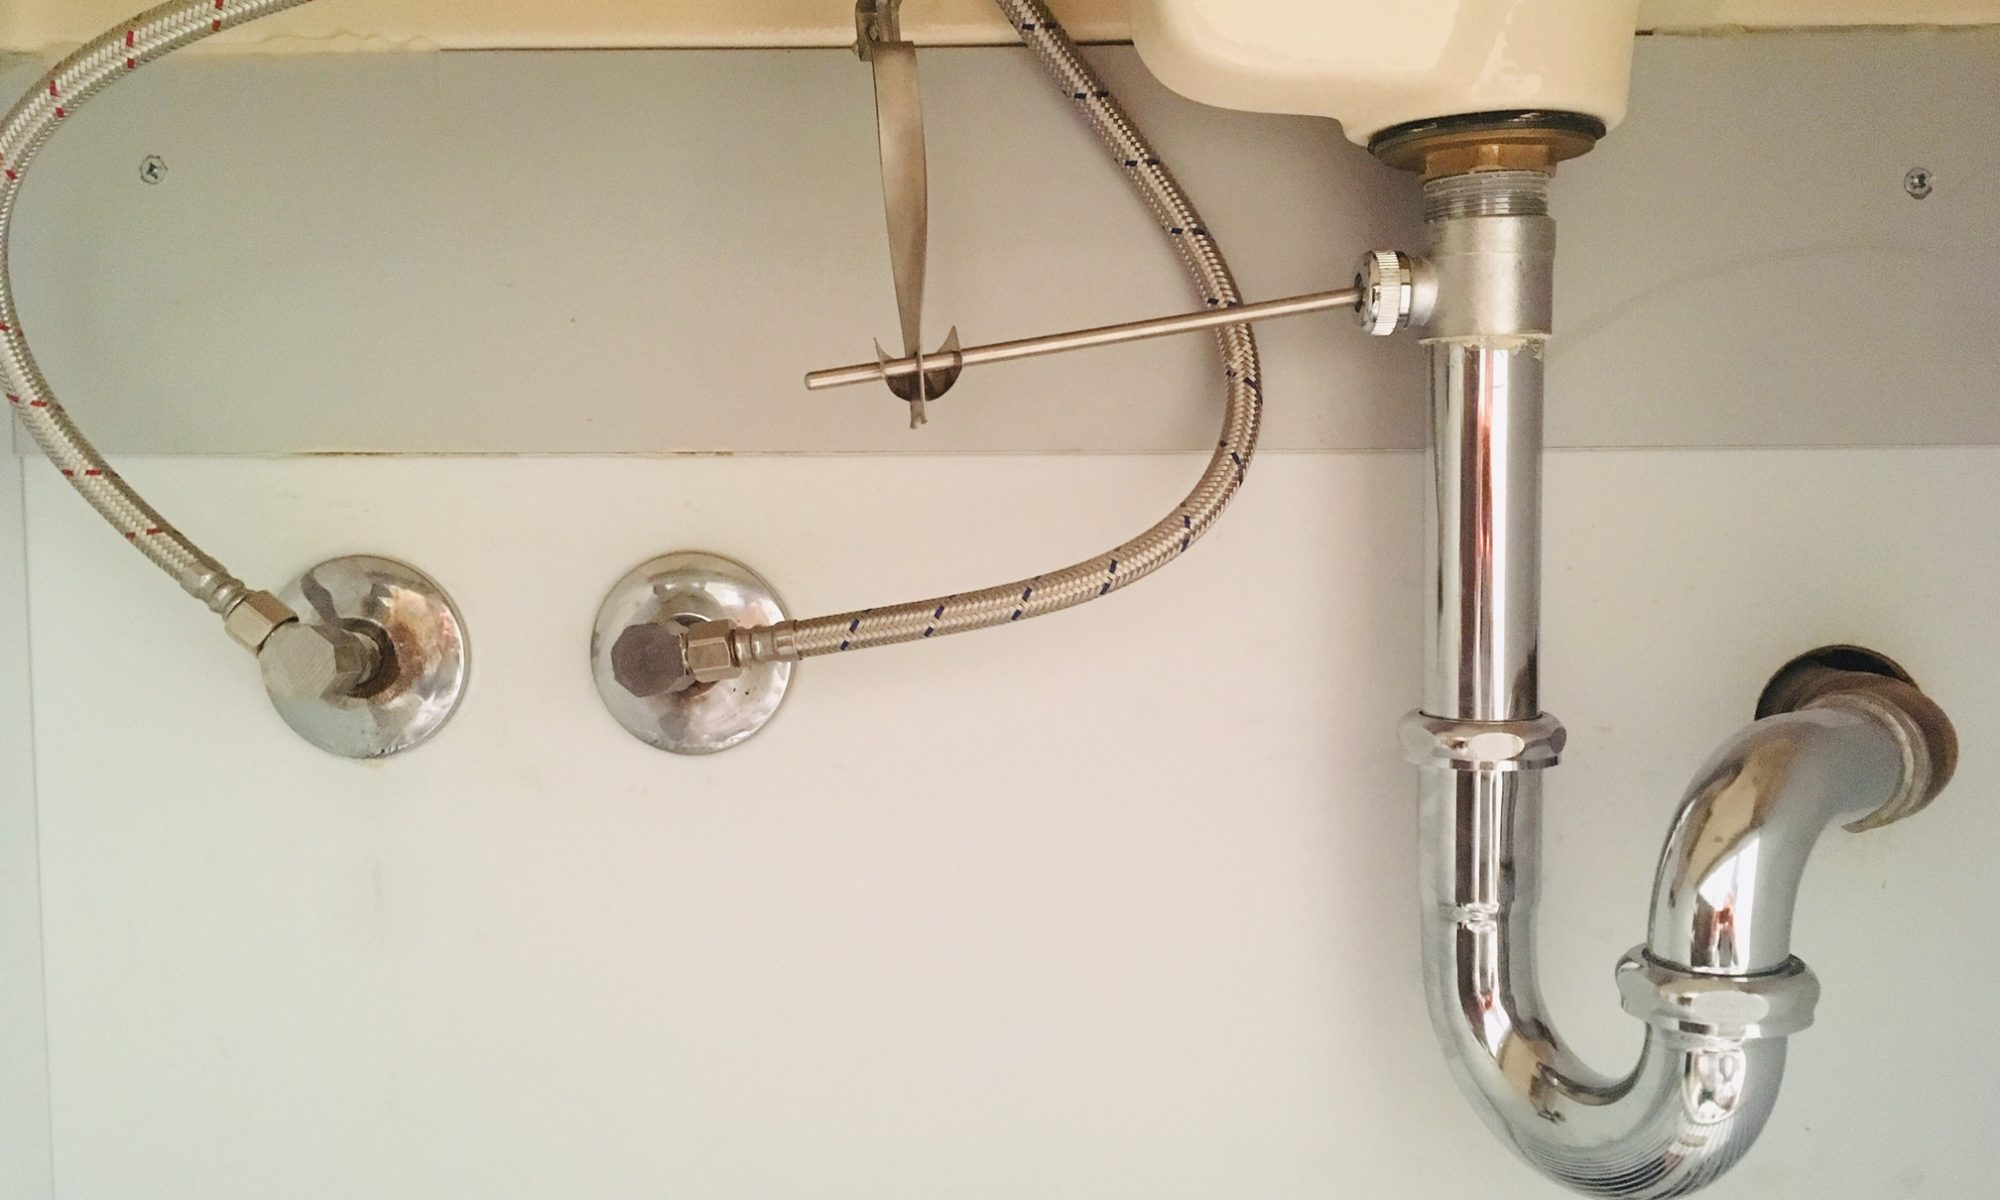 Condo handyman work